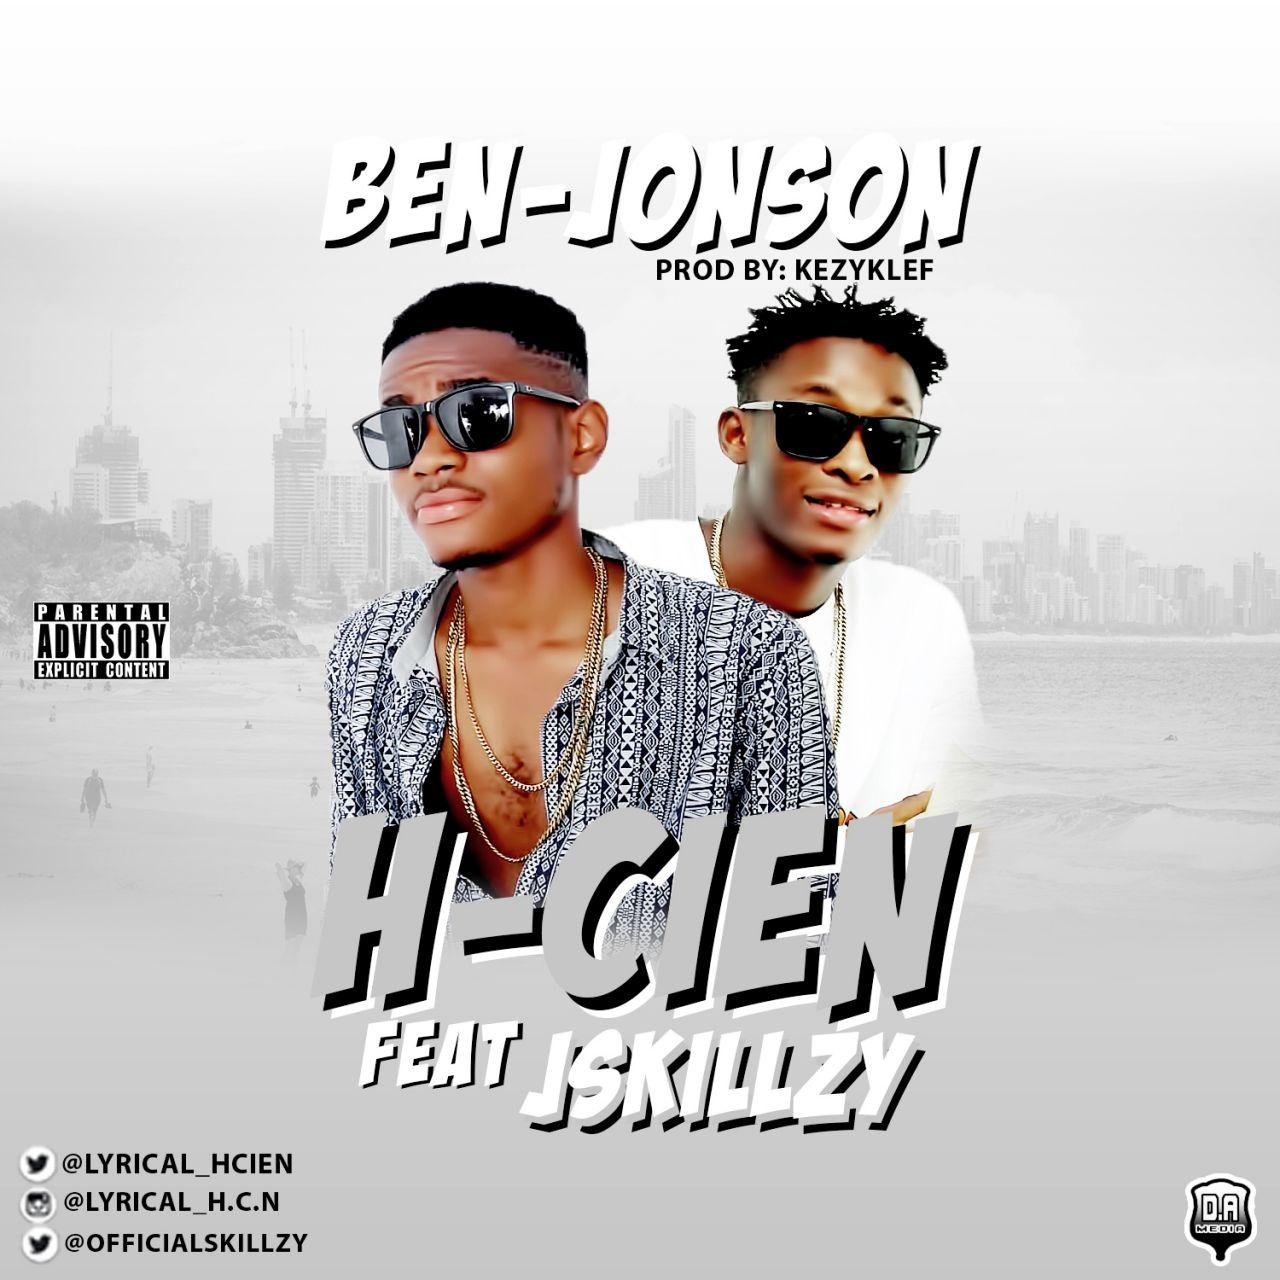 H-Cien X Jskillzy – Ben-Jonson